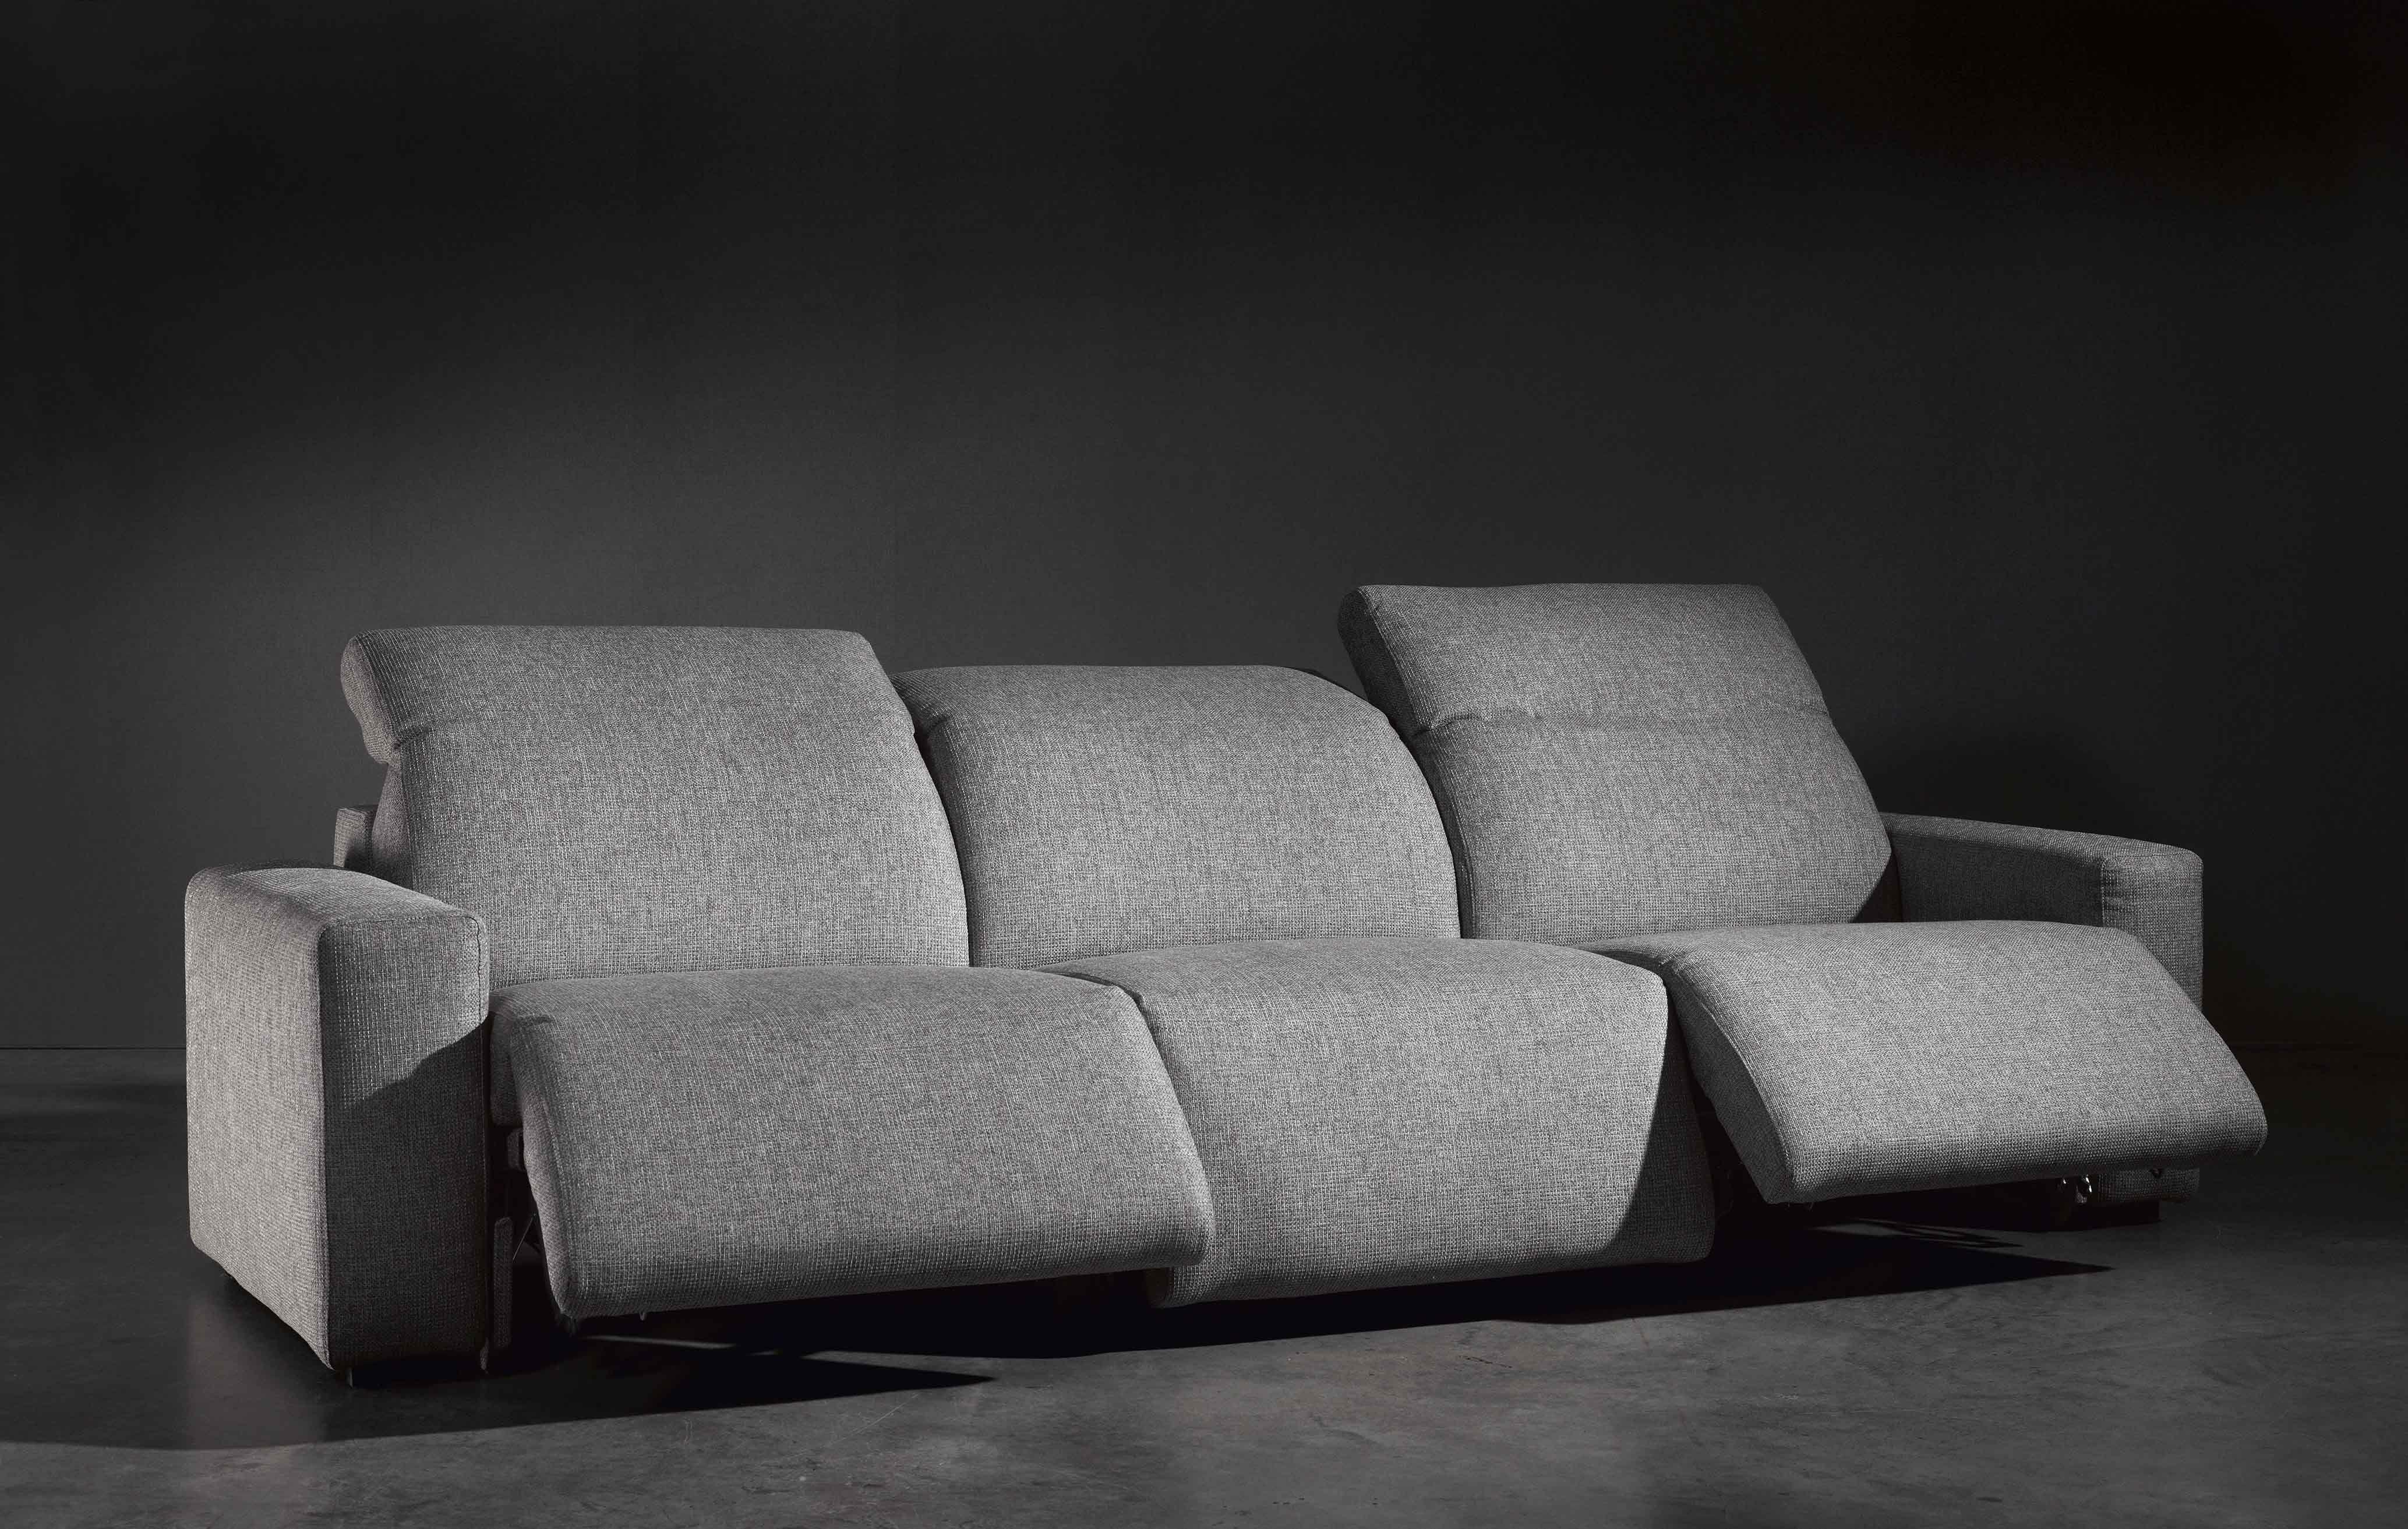 Home Cinema Sofa Home Cinema Furniture Cinema Room Recliner